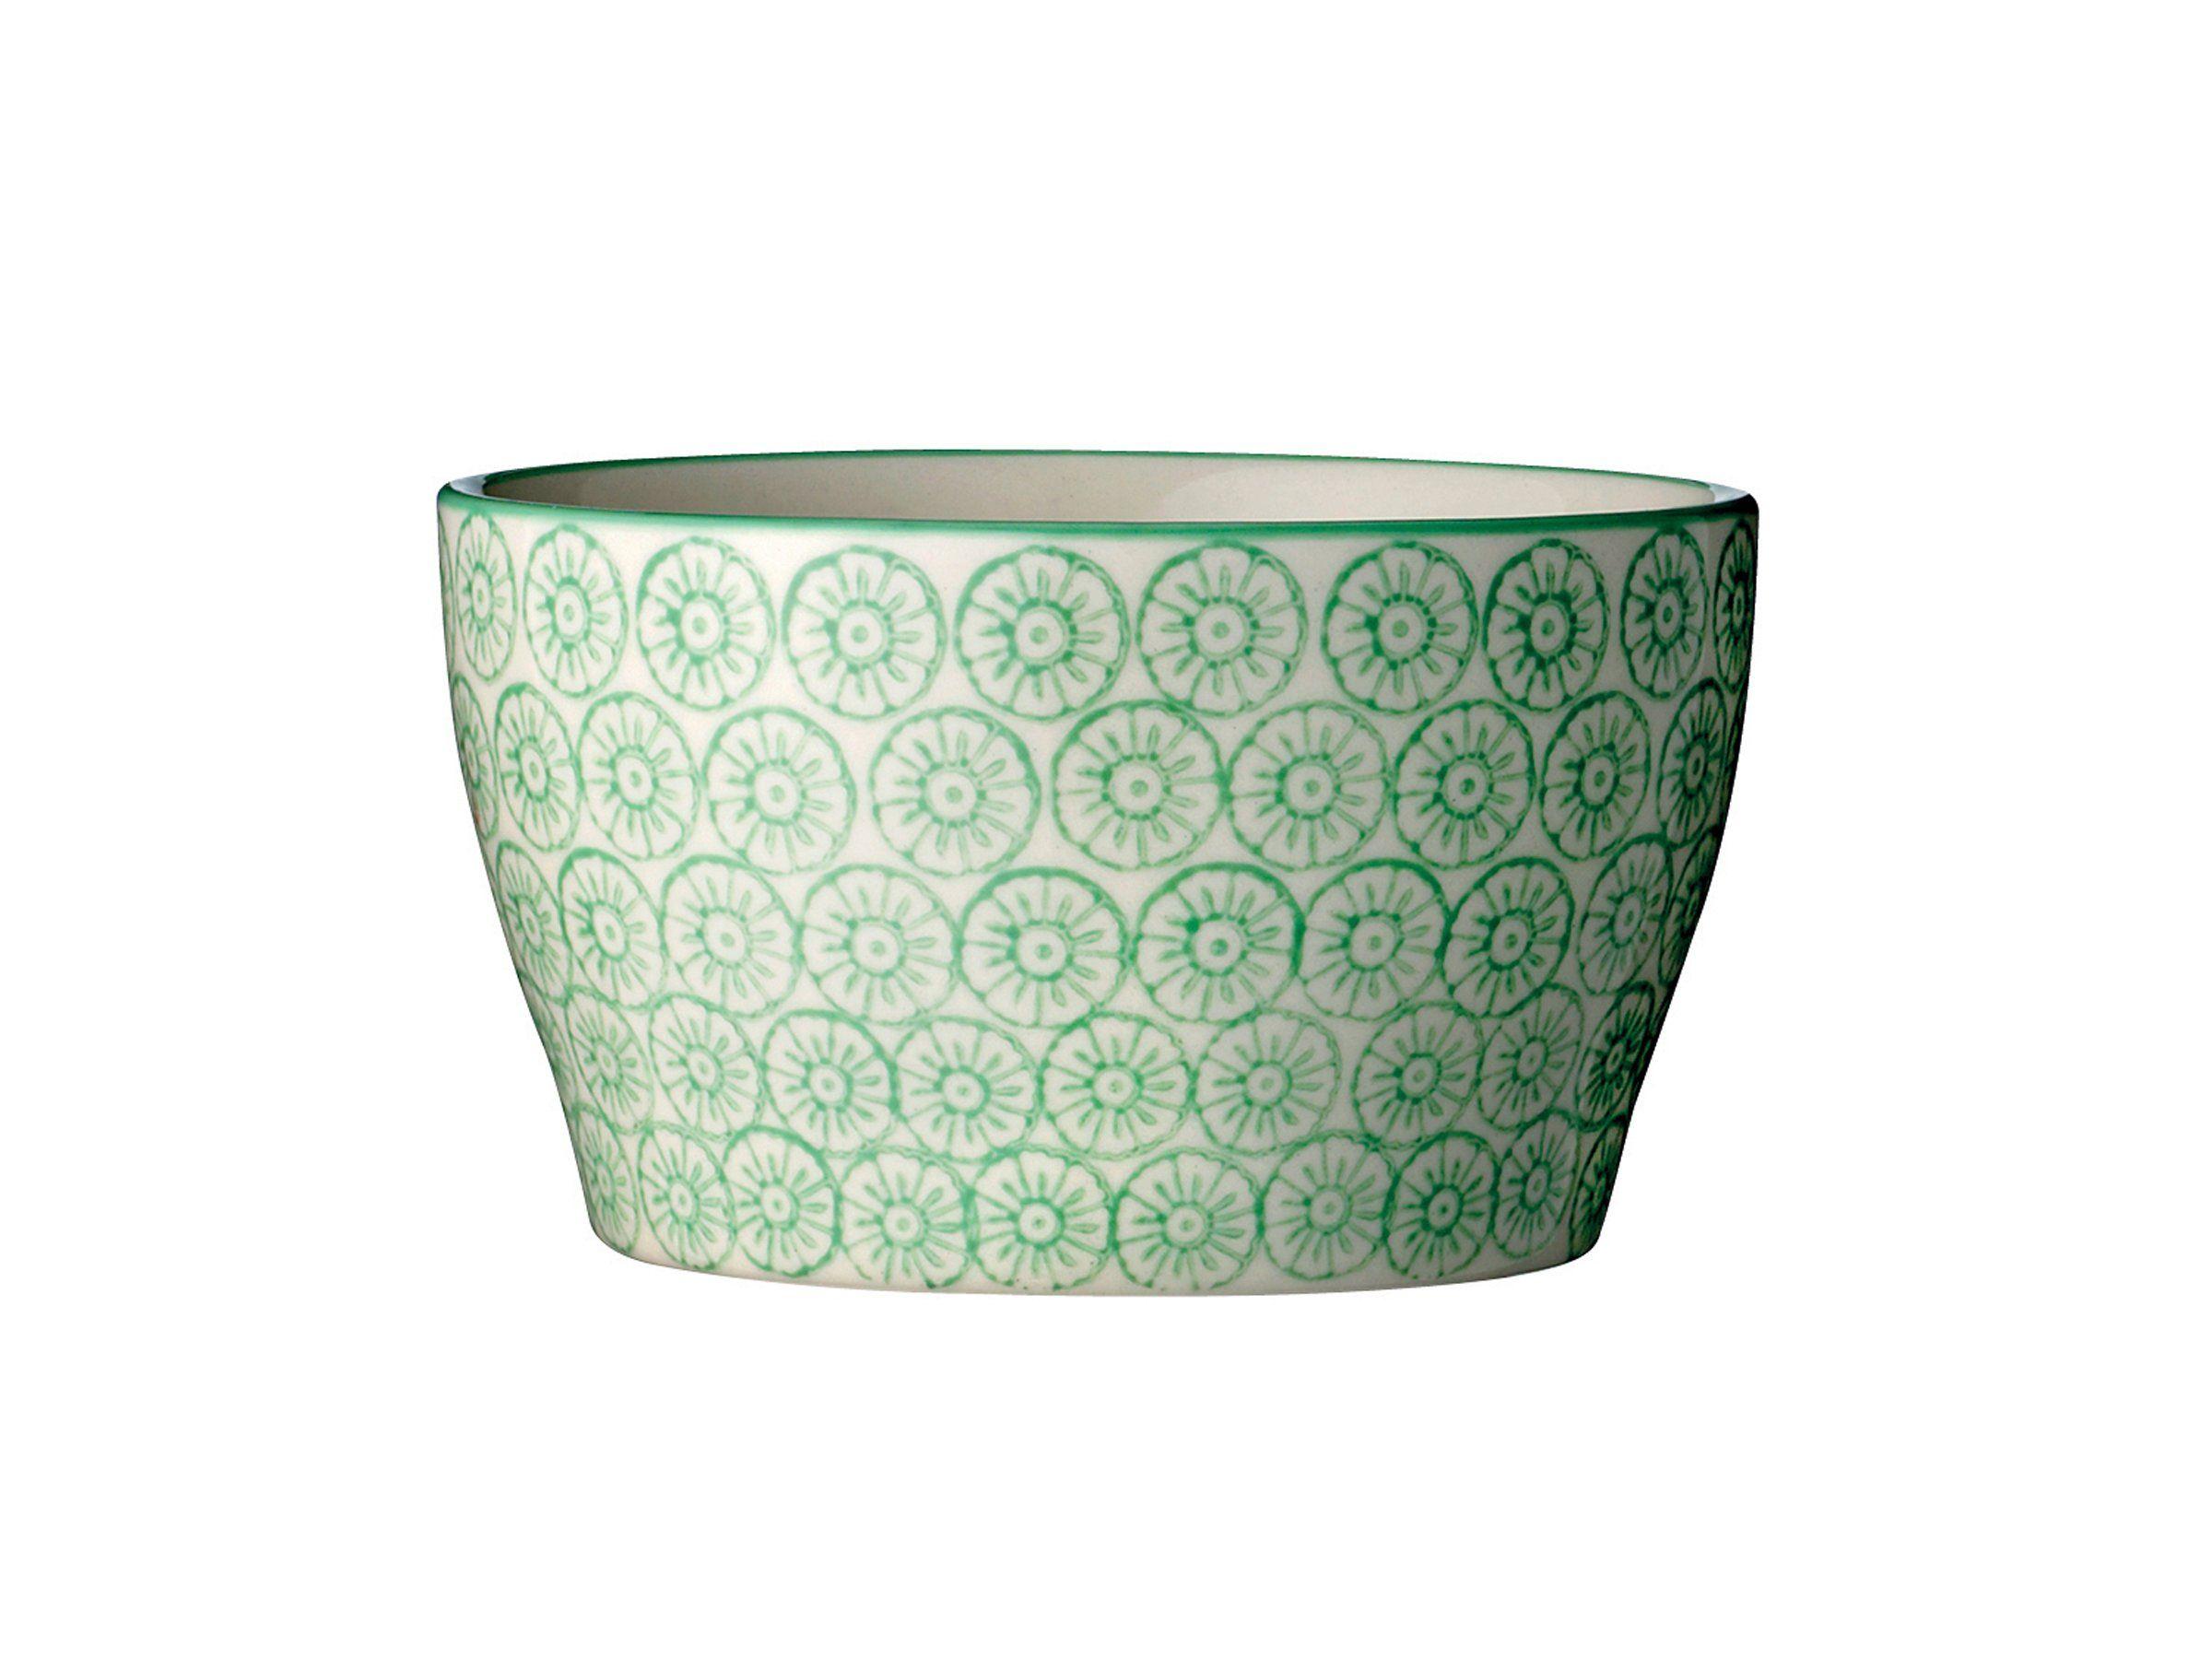 "#CZARKA / #MISECZKA #bowl #BLOOMINGVILLE #CERAMIC #VINTAGE ""ISABELLA"" #green | House Doctor, Bloomingville, Madame Stoltz, Nordal,#design #scandinavian #scandiconcept"